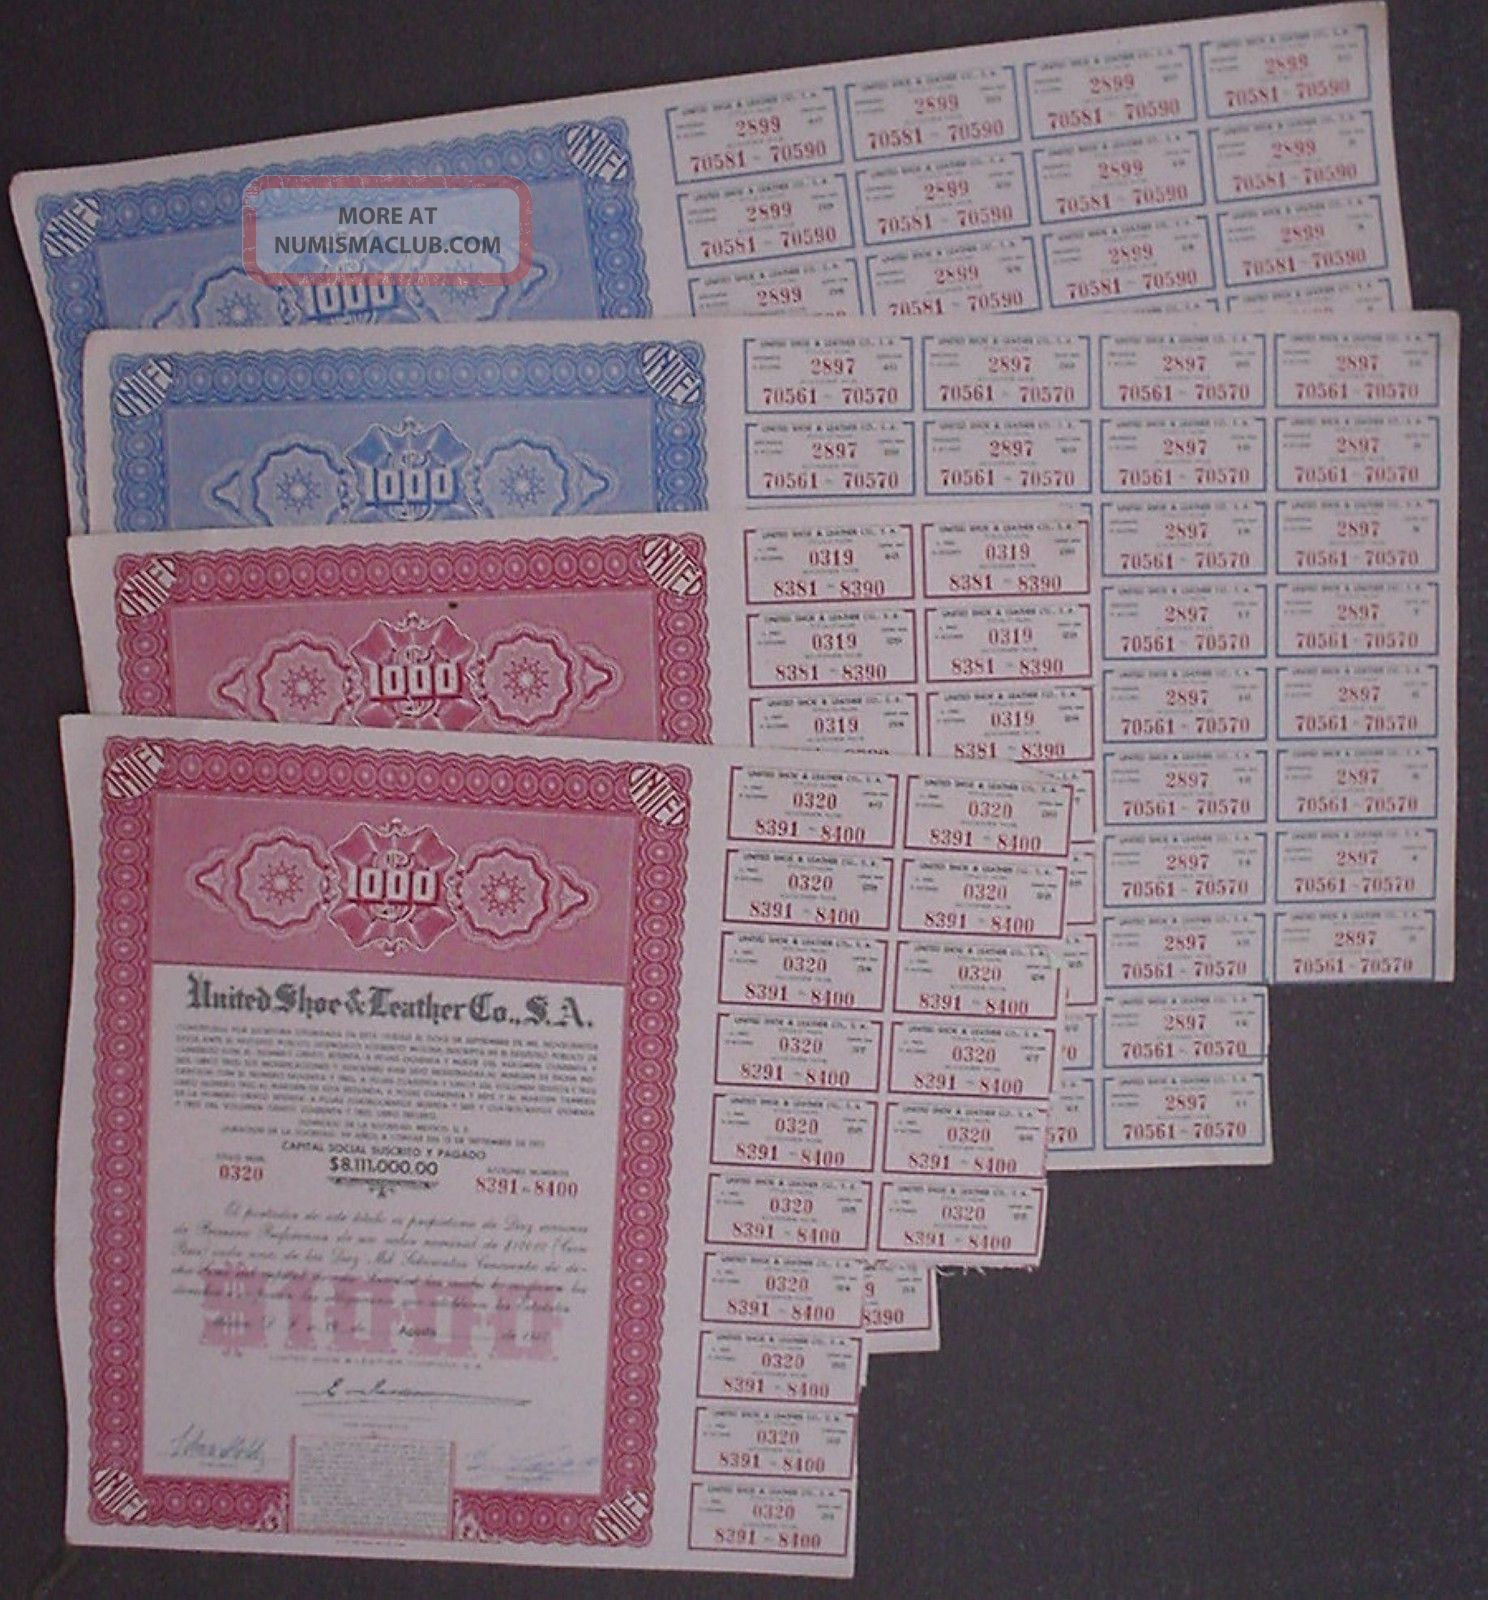 4 X United Shoe & Leather Co Sa.  Mexico $1000 Agosto 1947 Uncancelled + Coupons Stocks & Bonds, Scripophily photo